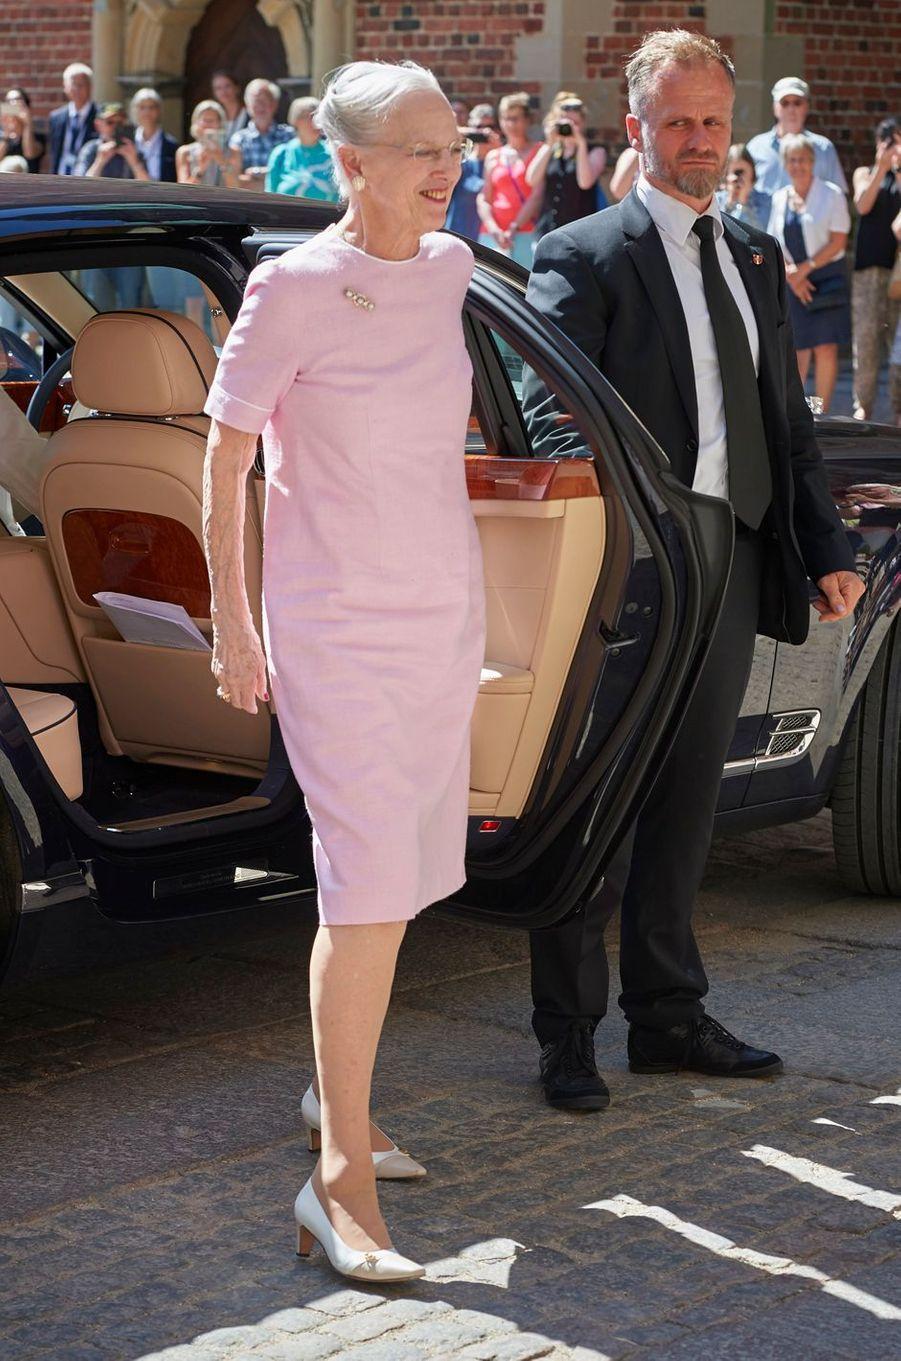 La reine Margrethe II de Danemark au château de Frederiksborg, le 24 mai 2018